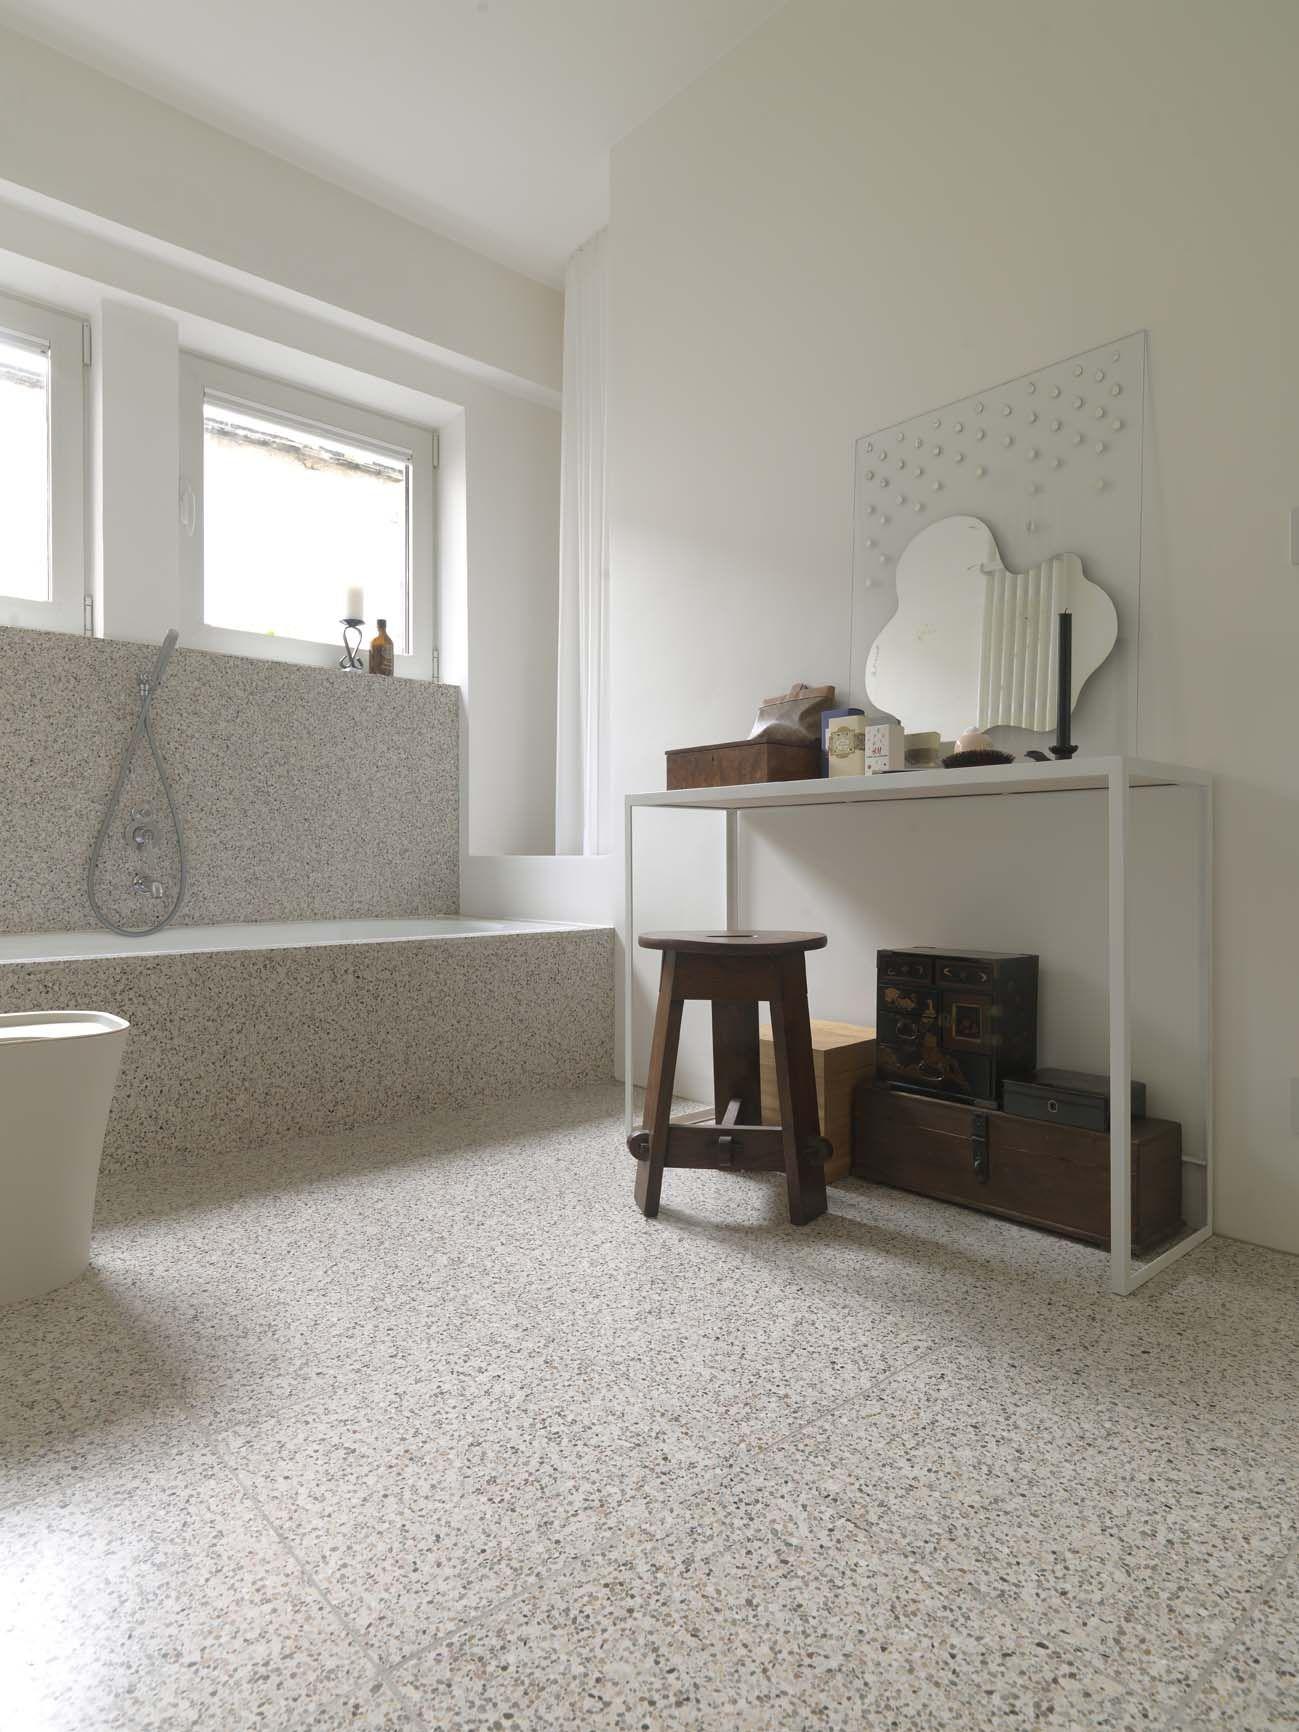 Terrazzo Kitchen Floor Amazing Bathroom And Bathtub Created Using Beautiful Terrazzo